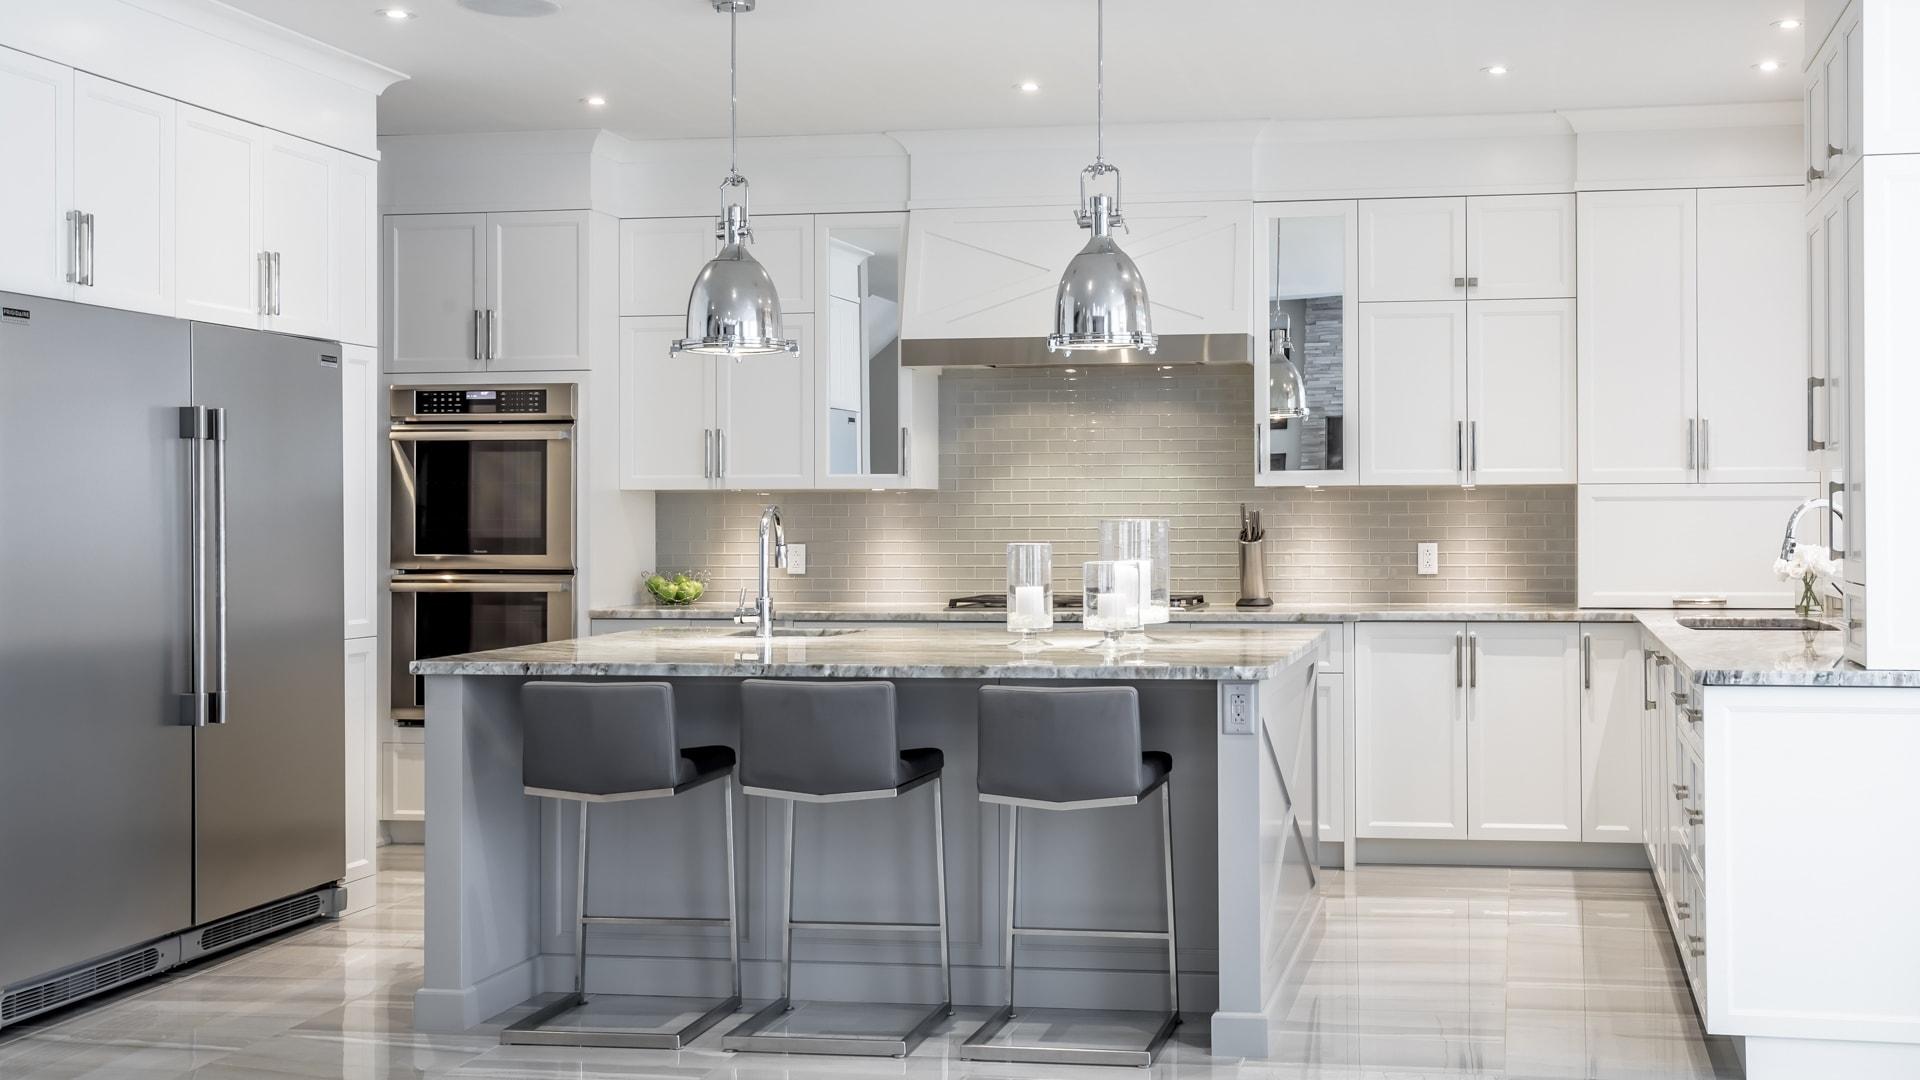 Kitchen Renovations: Where to Begin?